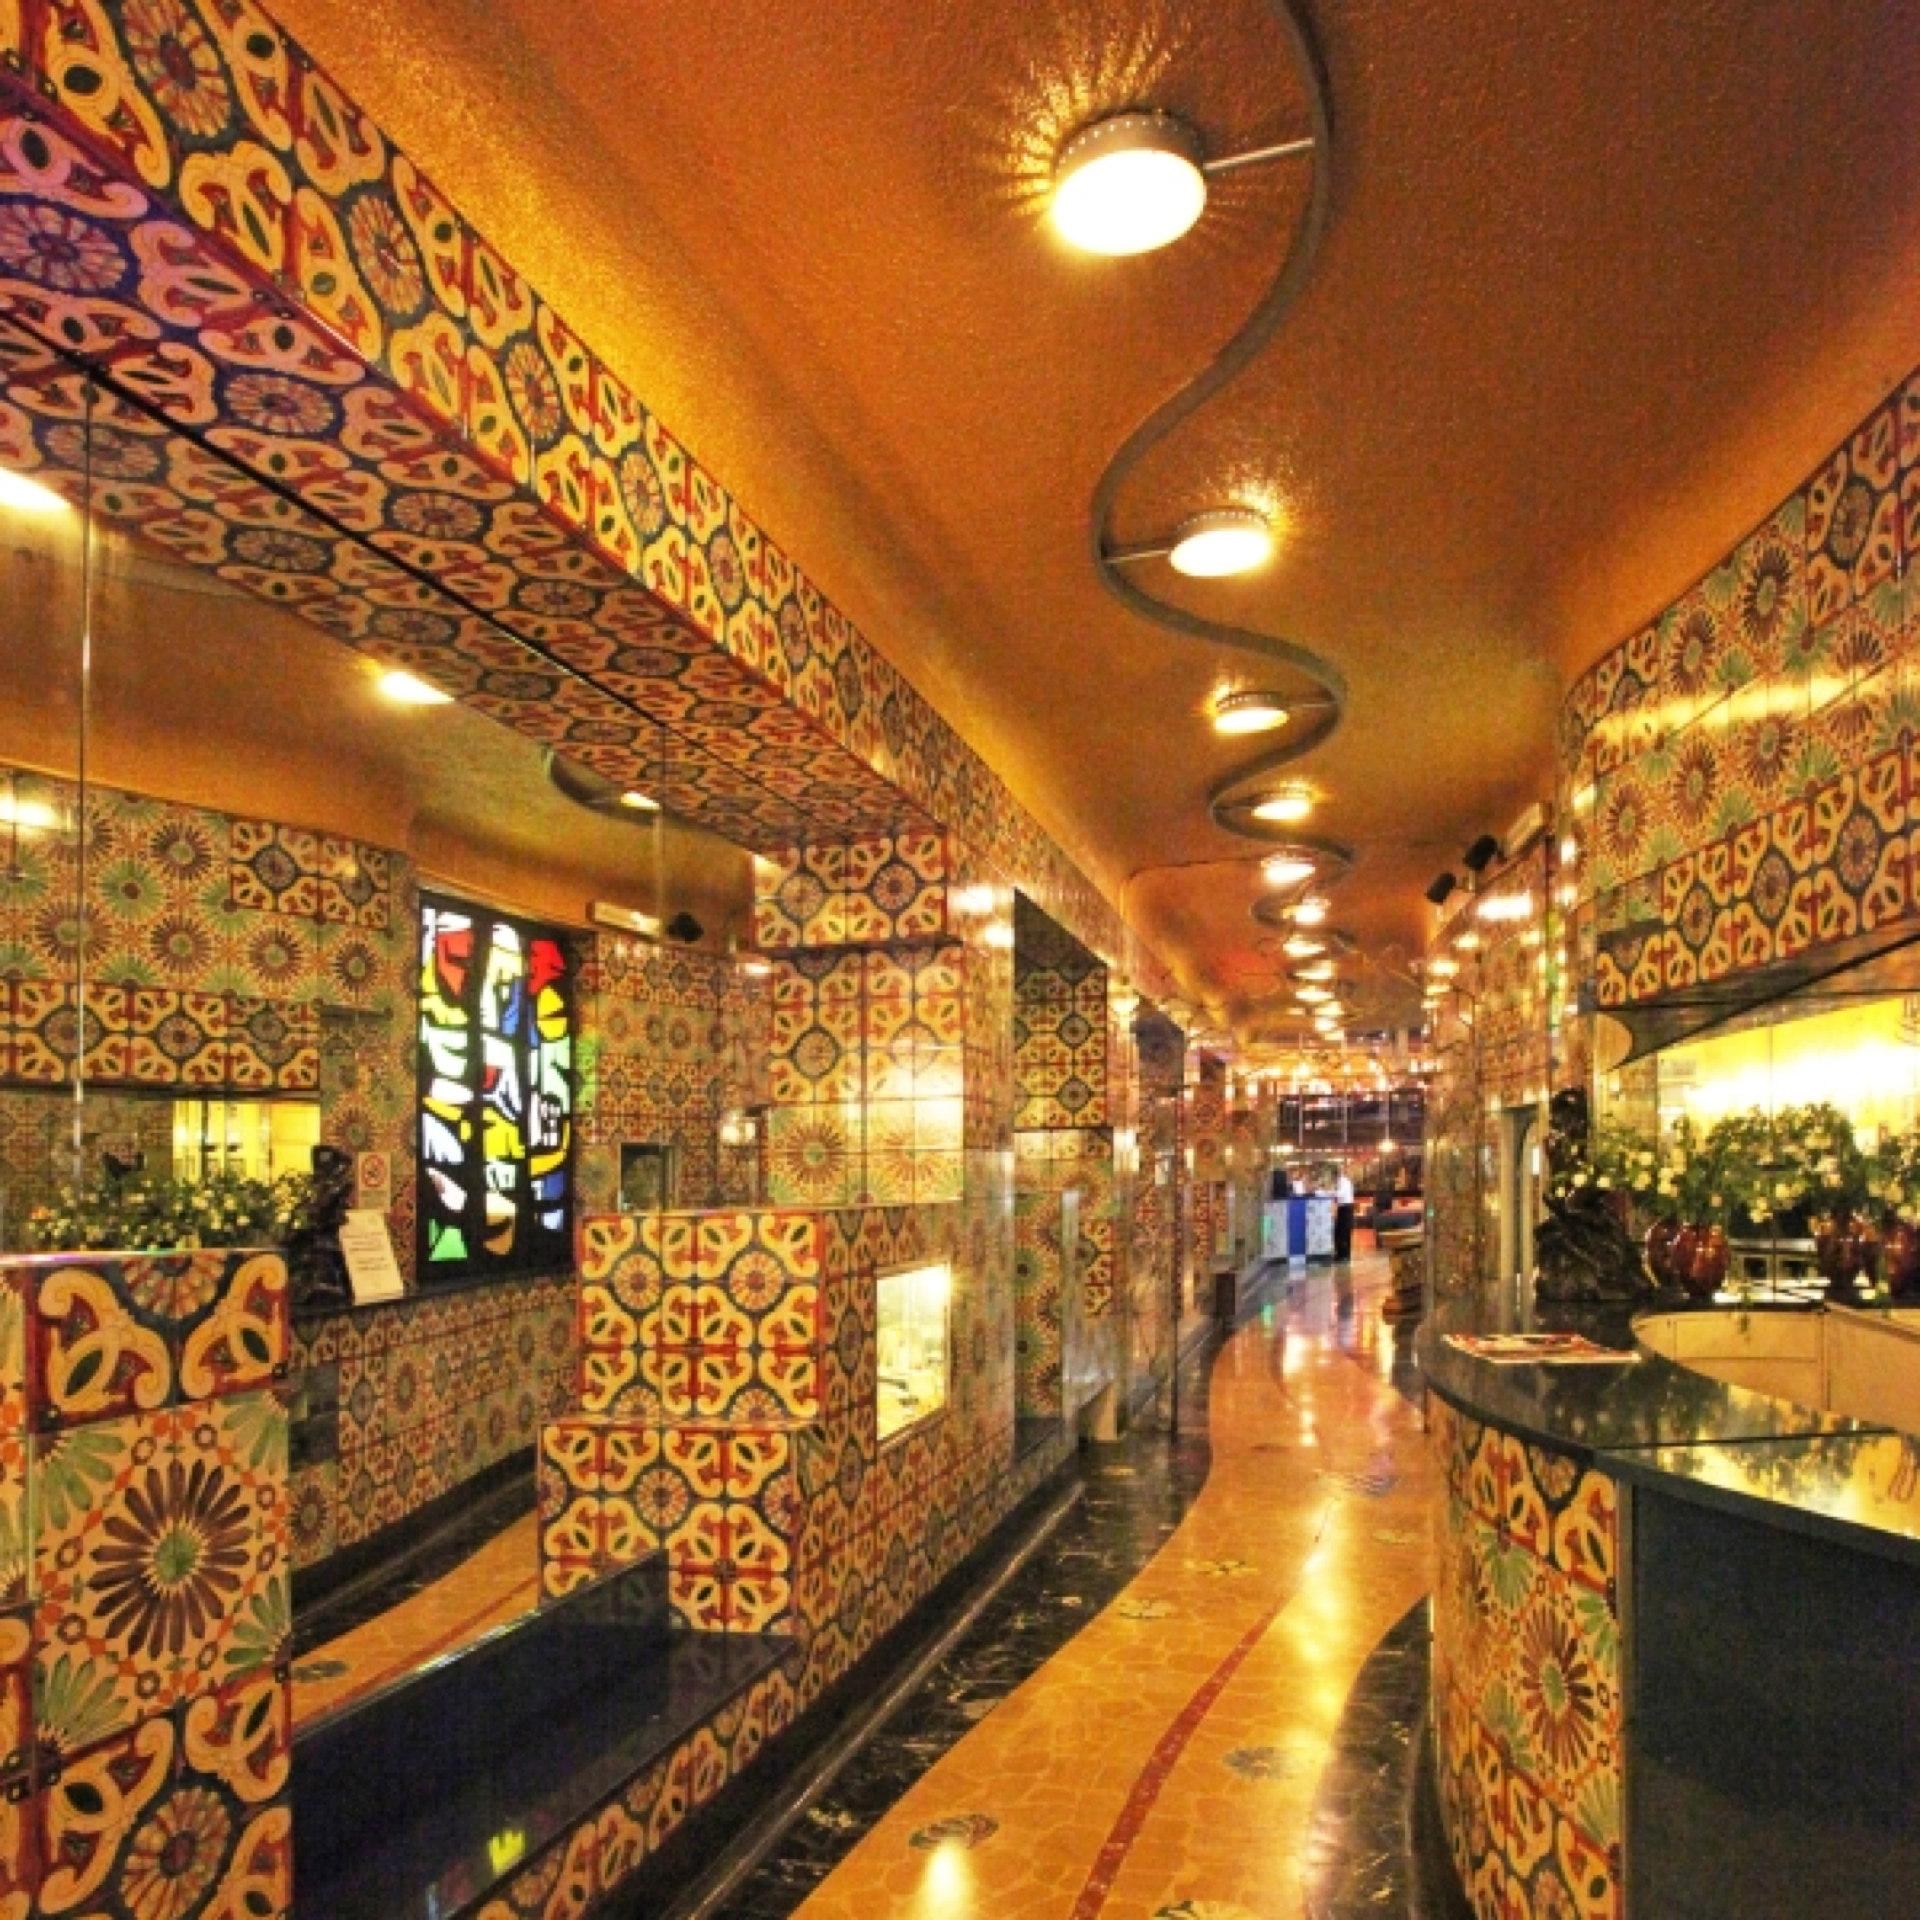 Design and pop culture in Italian nightclubs